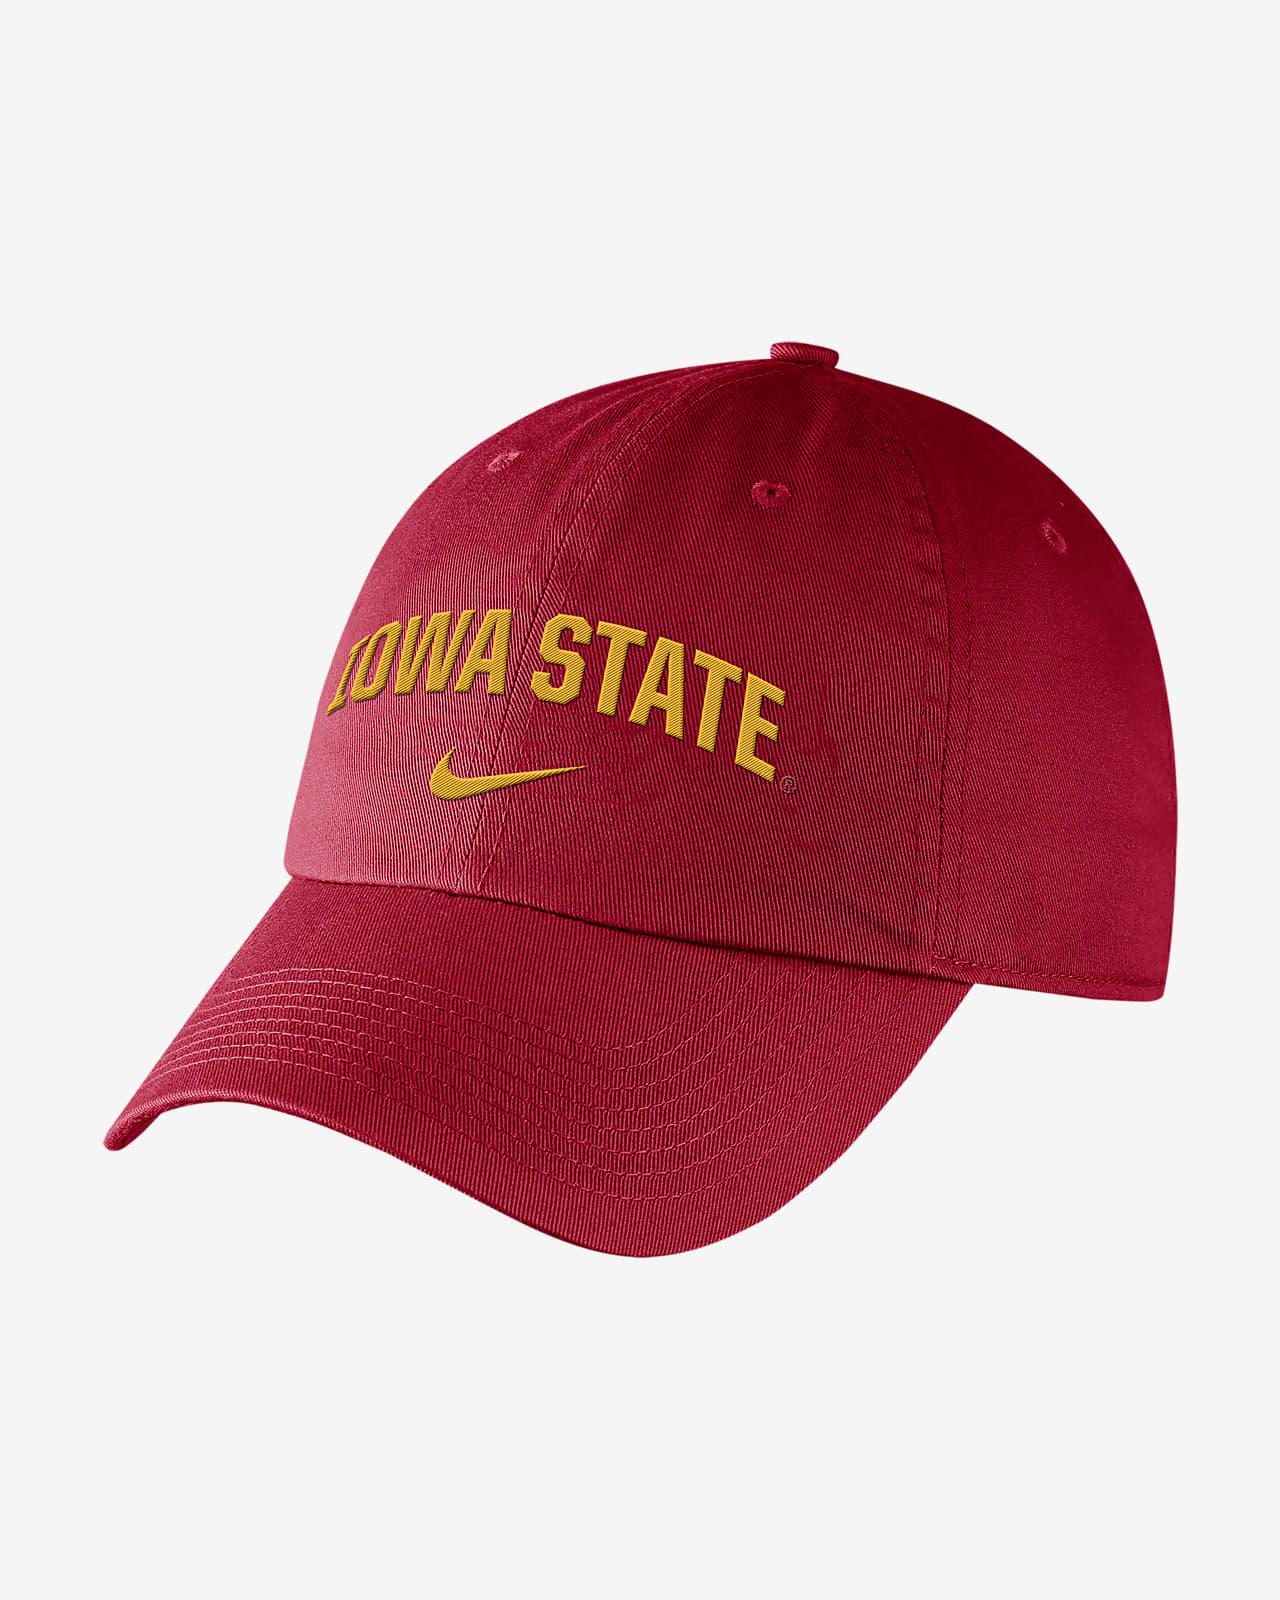 Nike College (Iowa State) Hat